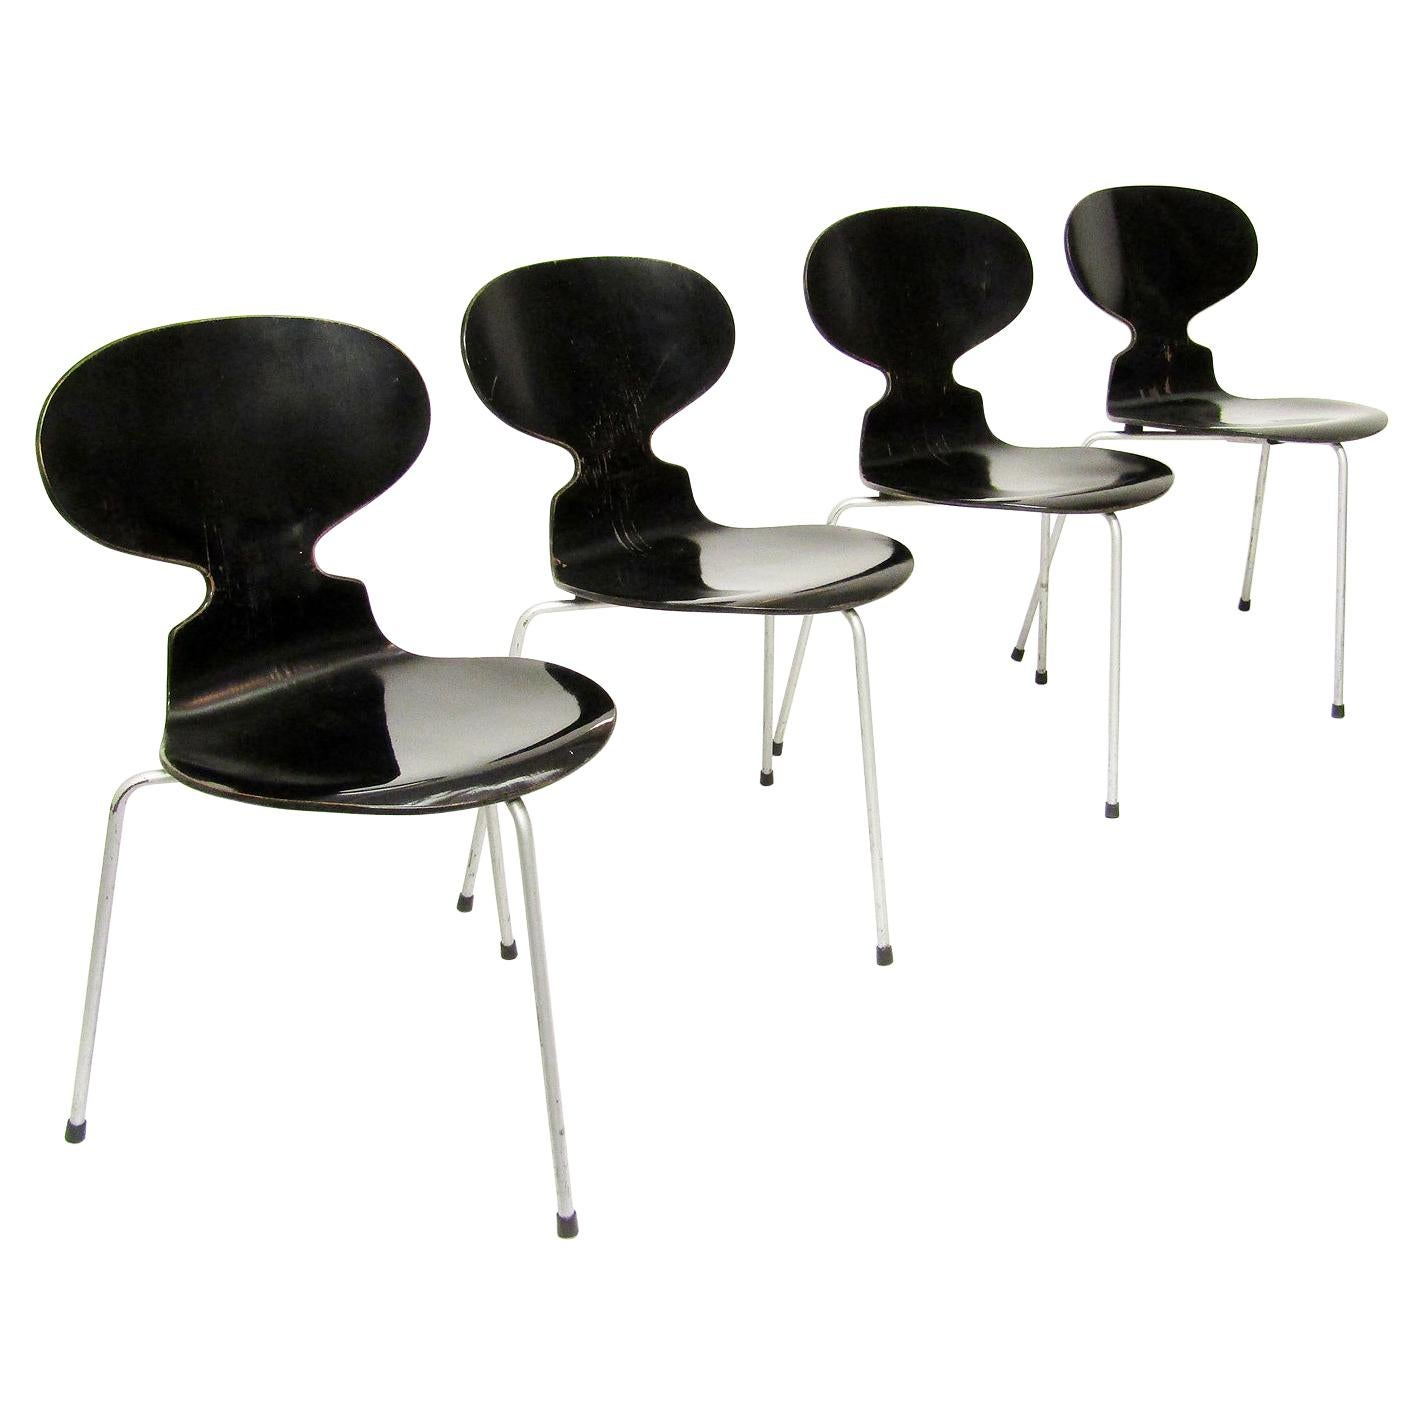 Set of Four Black 1950s Danish Ant Chairs by Arne Jacobsen for Fritz Hansen